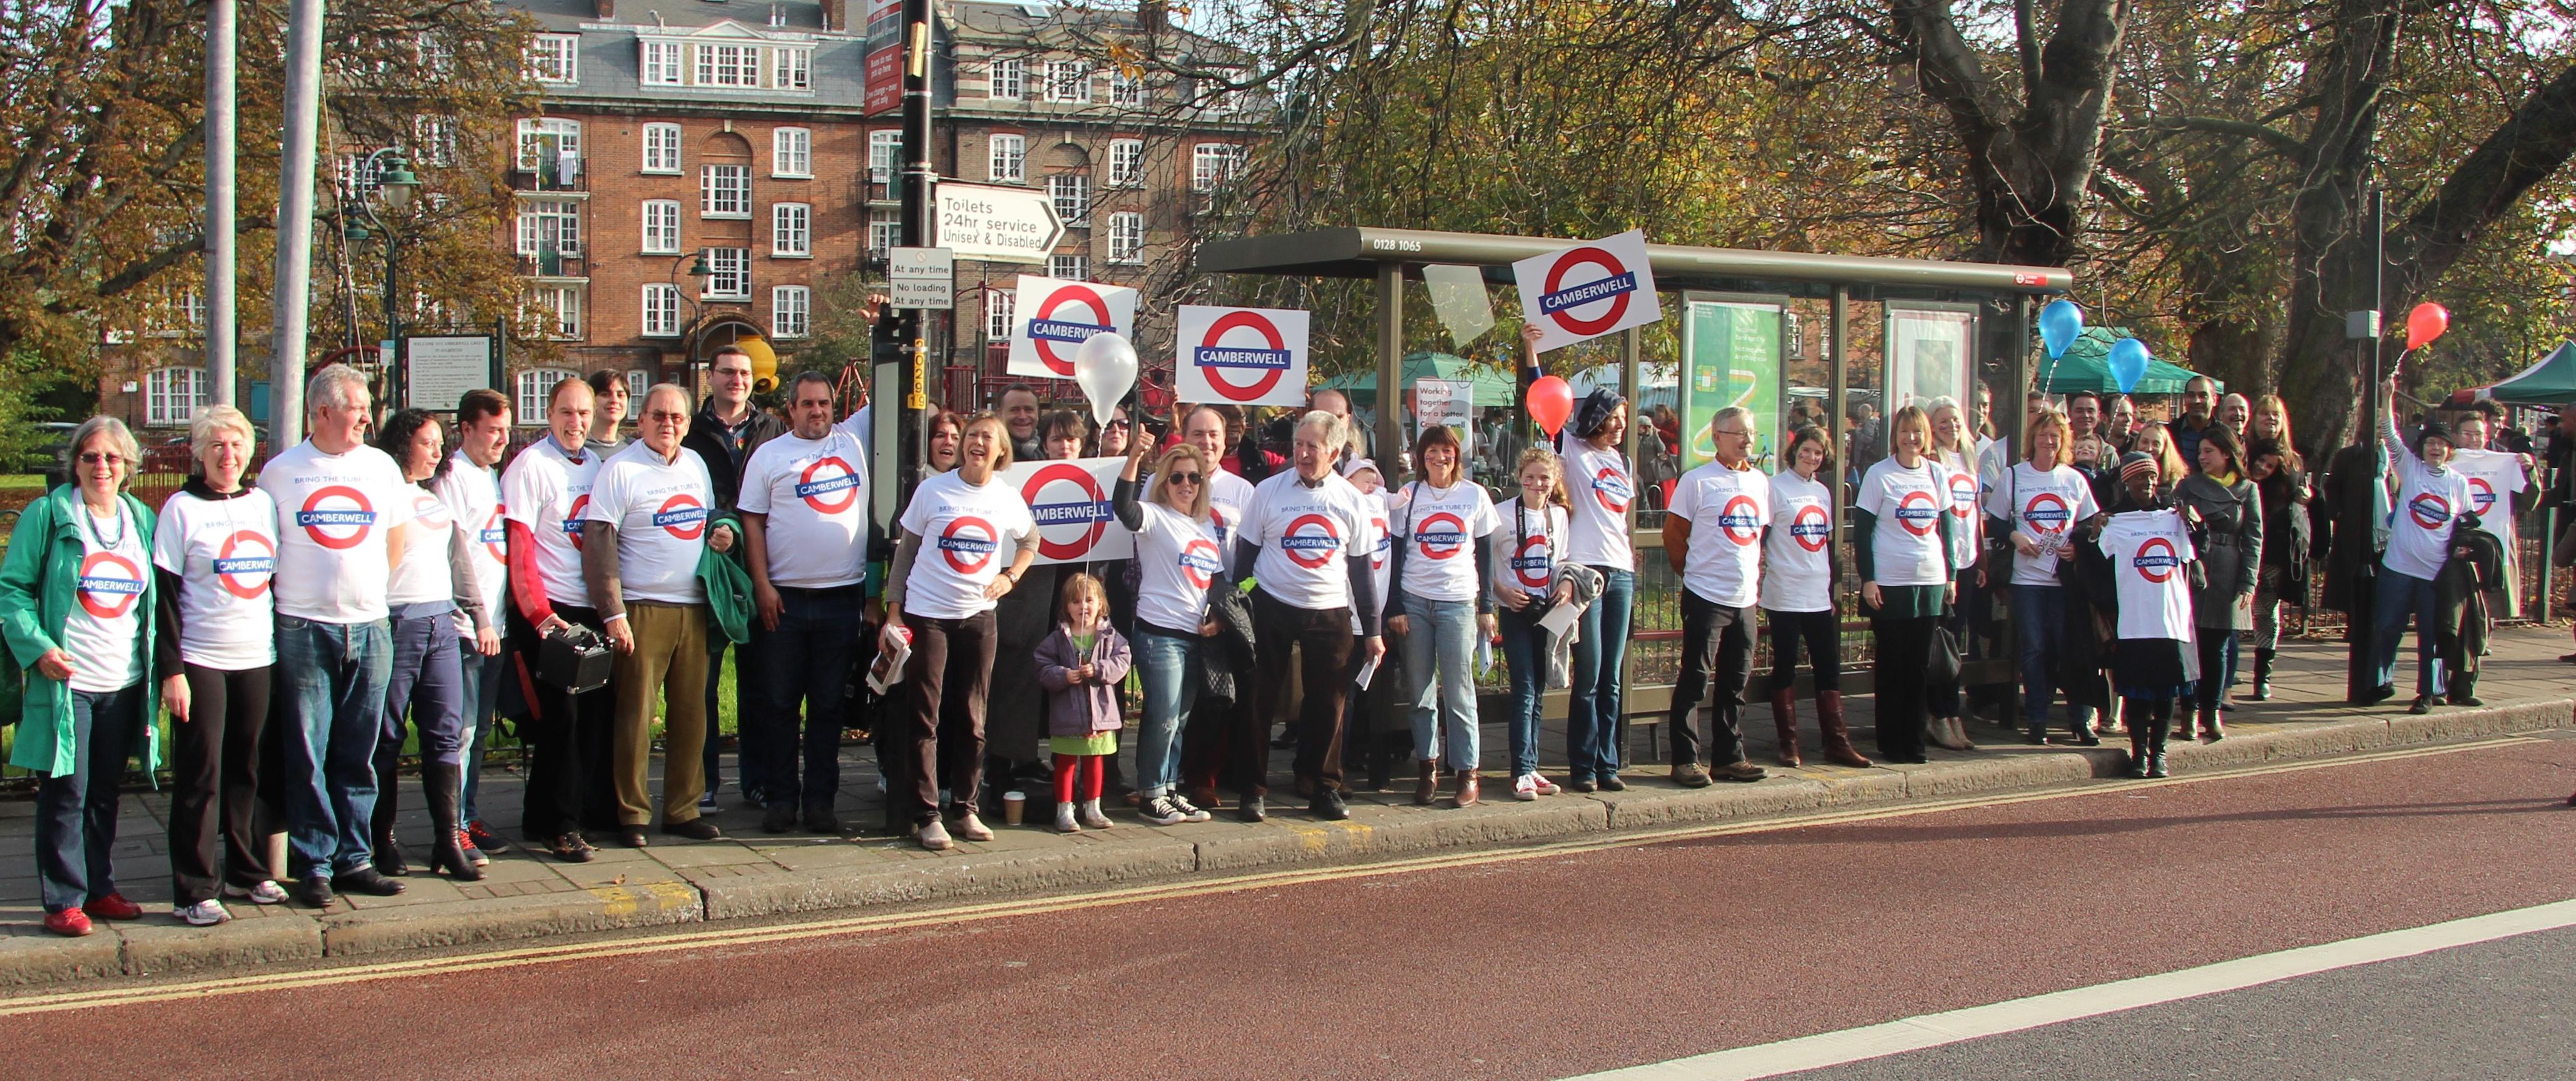 Bakerloo_Line_Ext_rally_29_11_2014.jpg